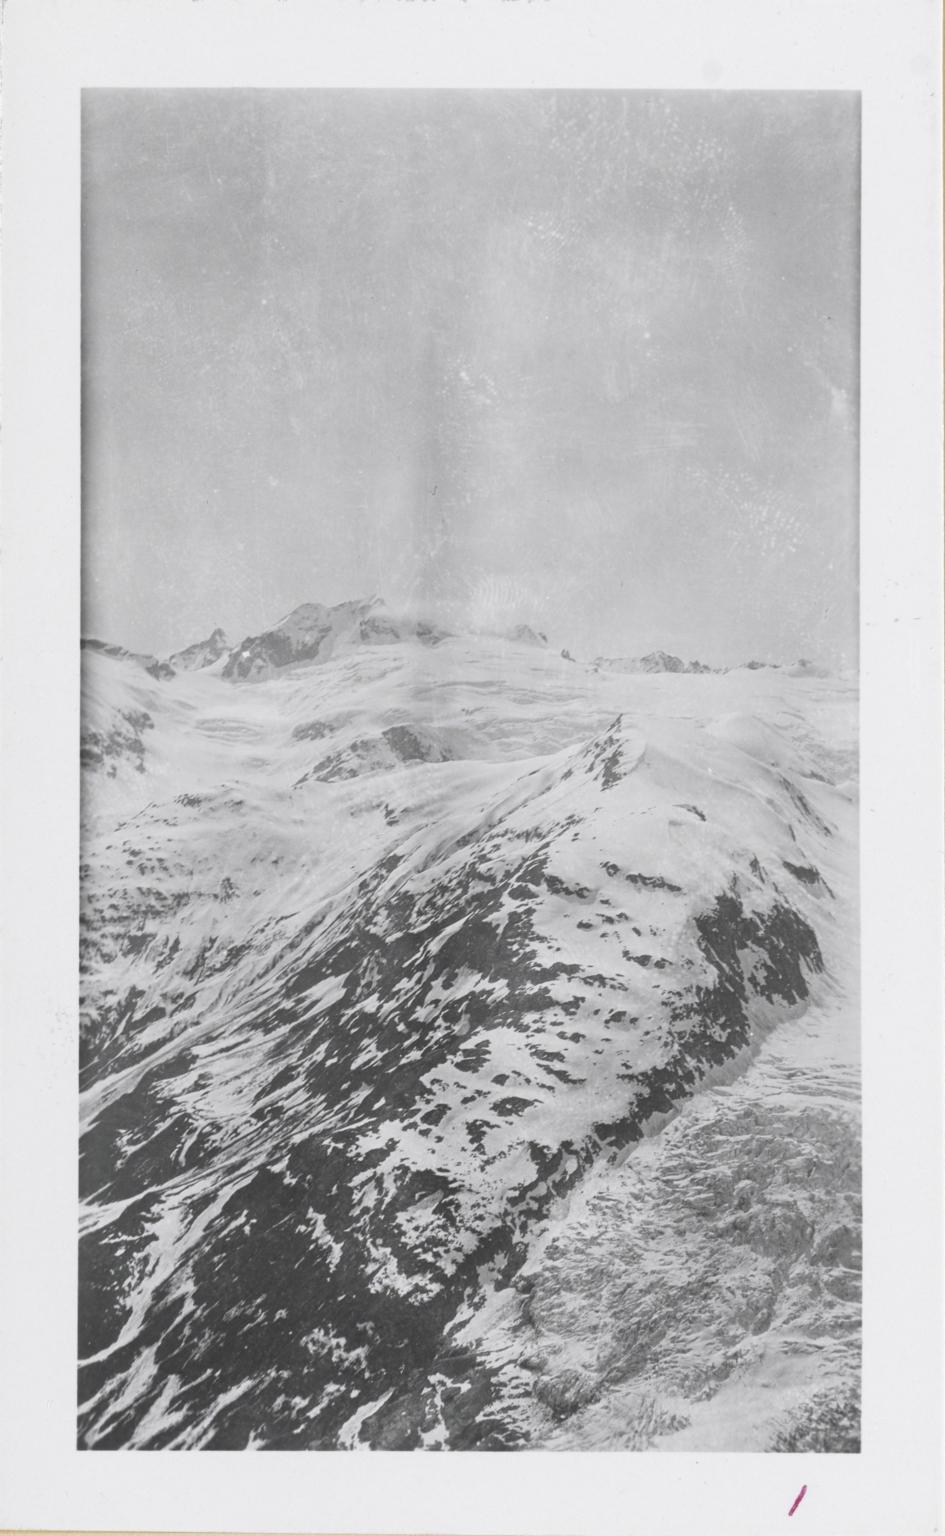 Unknown glacier, Mount Redoubt, Alaska